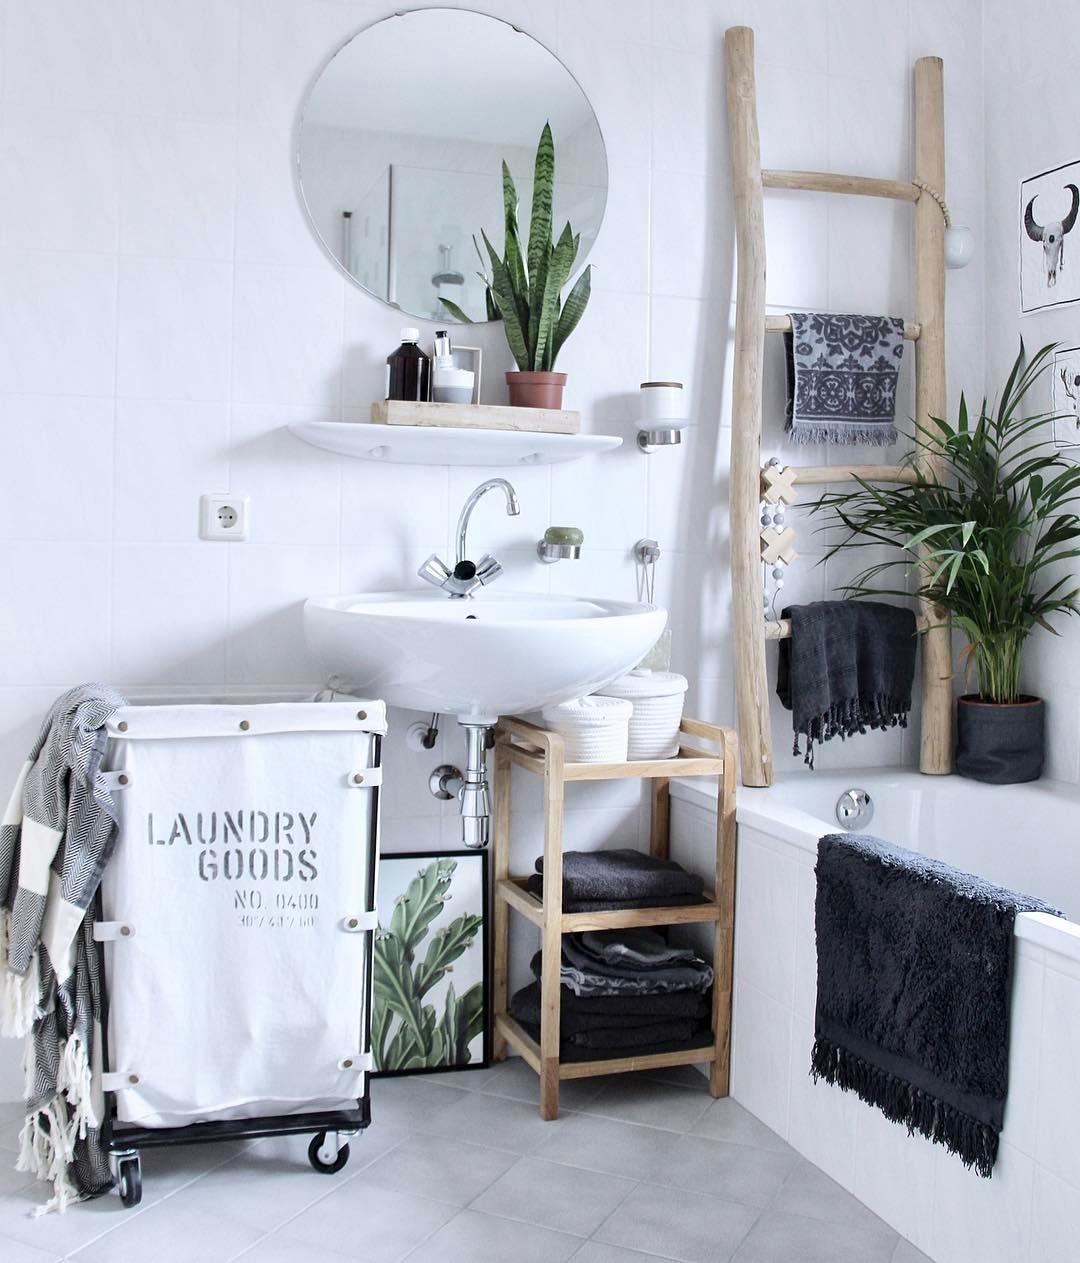 Shabby Chic Bathroom Decor Designs And Inspiration Homeshabby Com Design Home Plans Home Decorating And Interior Design